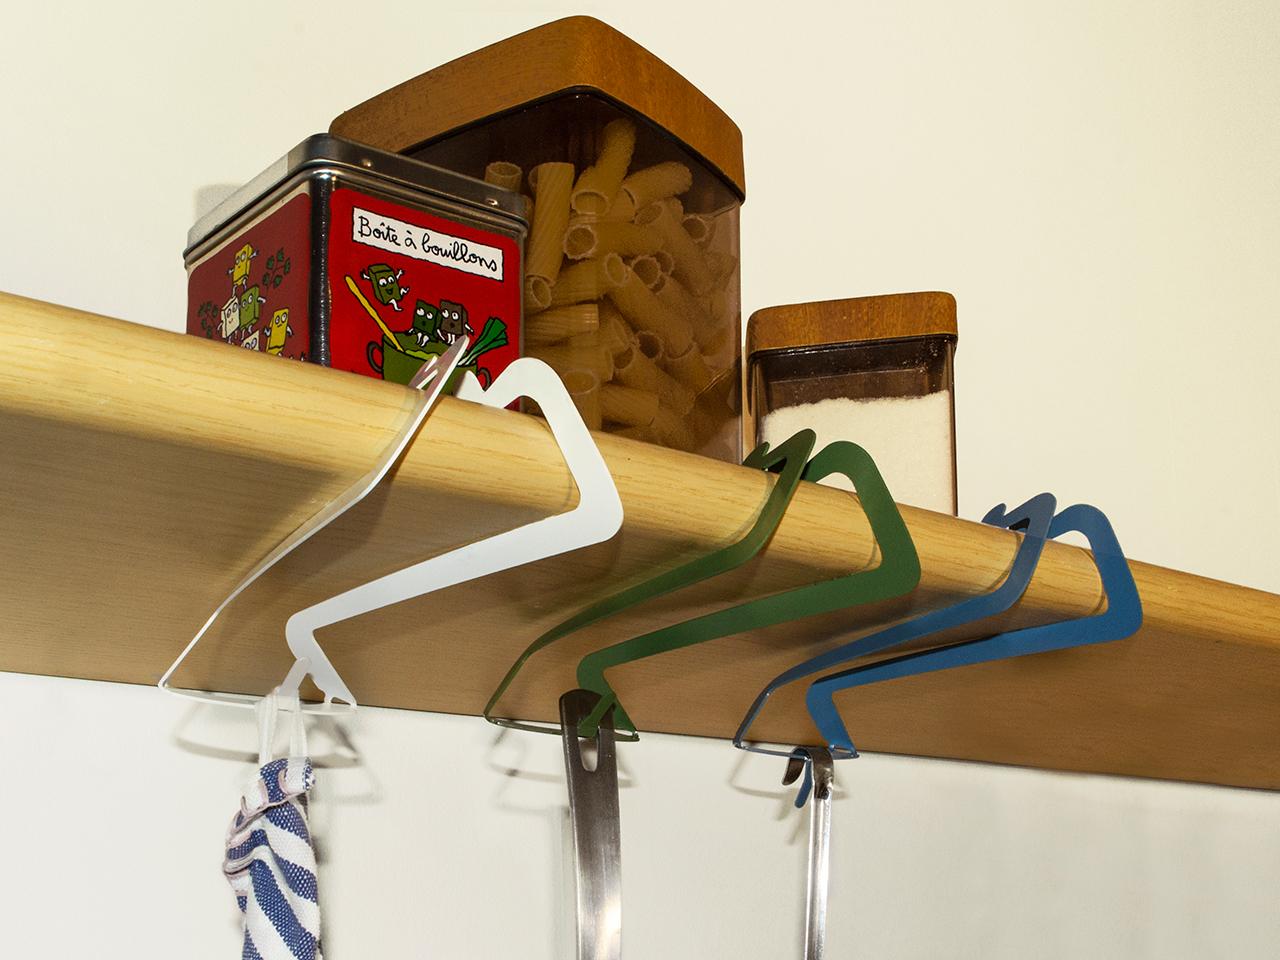 Ganci per utensili da cucina passpartout for Utensili cucina online shop